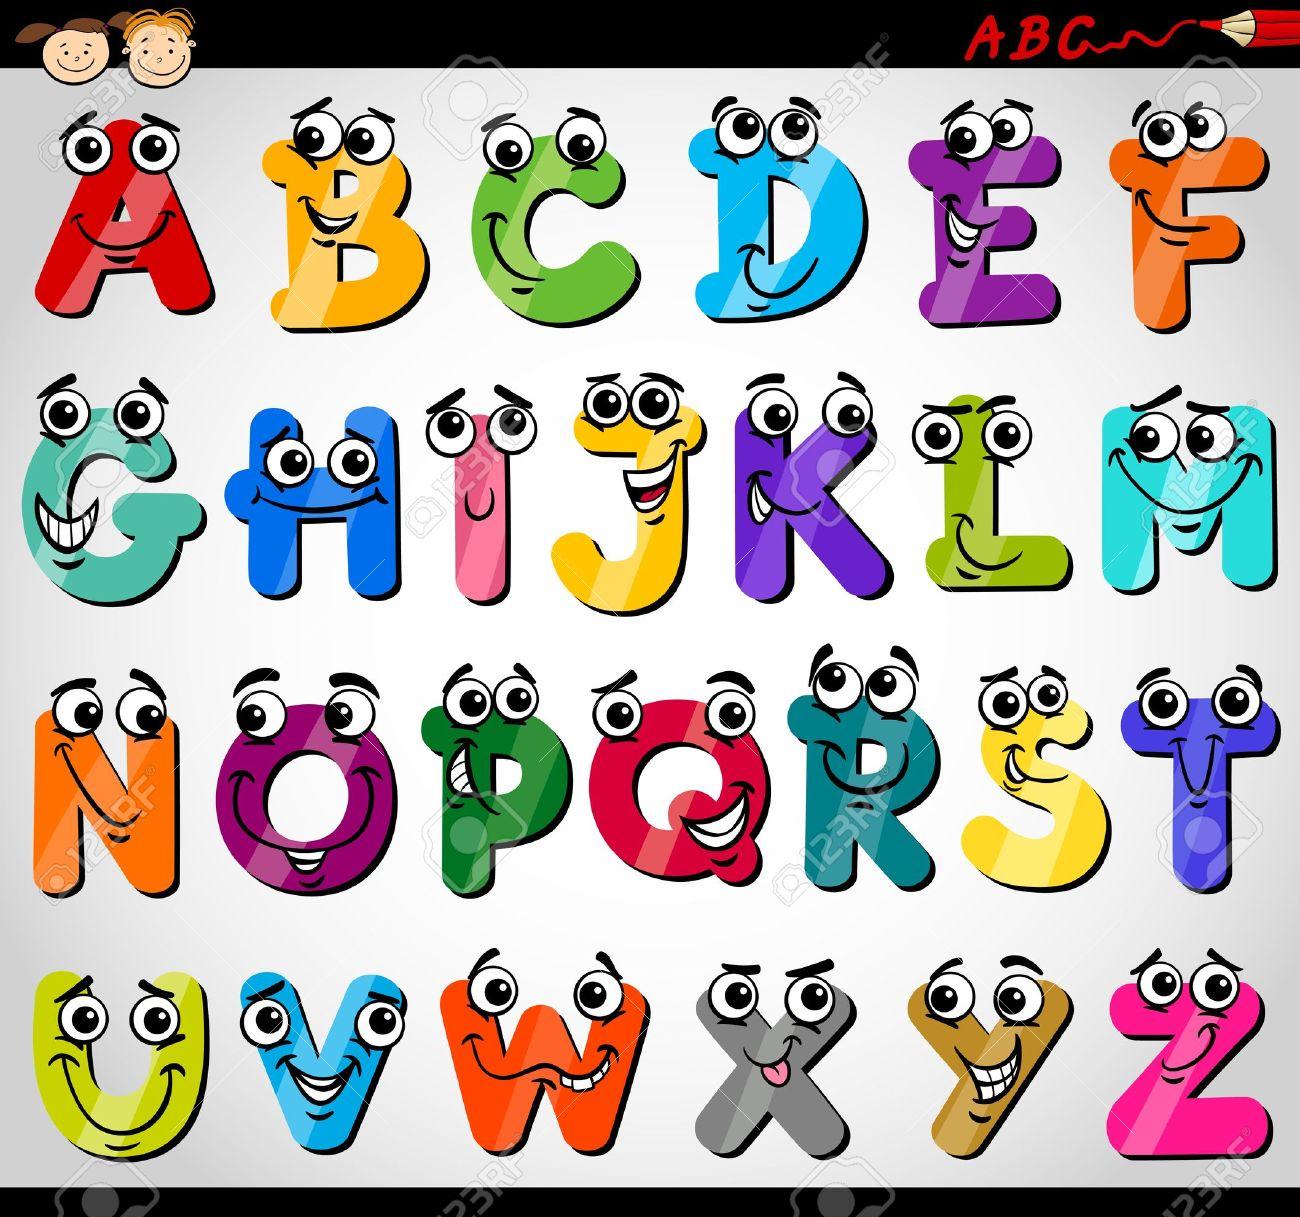 Cartoon Illustration of Funny Capital Letters Alphabet for Children...